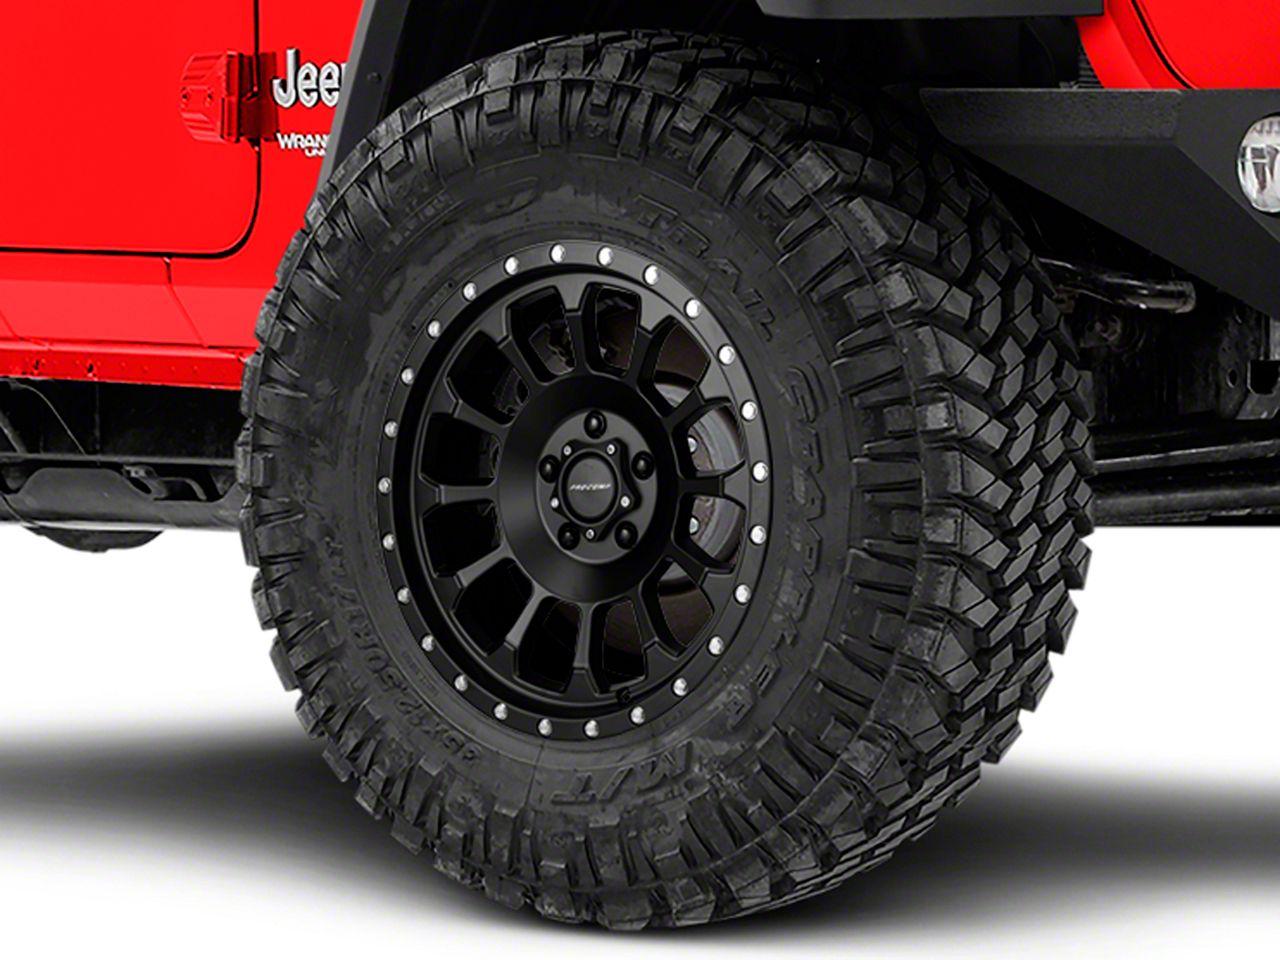 Pro Comp Wheels Alloy Series 34 Rockwell Satin Black Wheel - 18x9 (18-19 Jeep Wrangler JL)